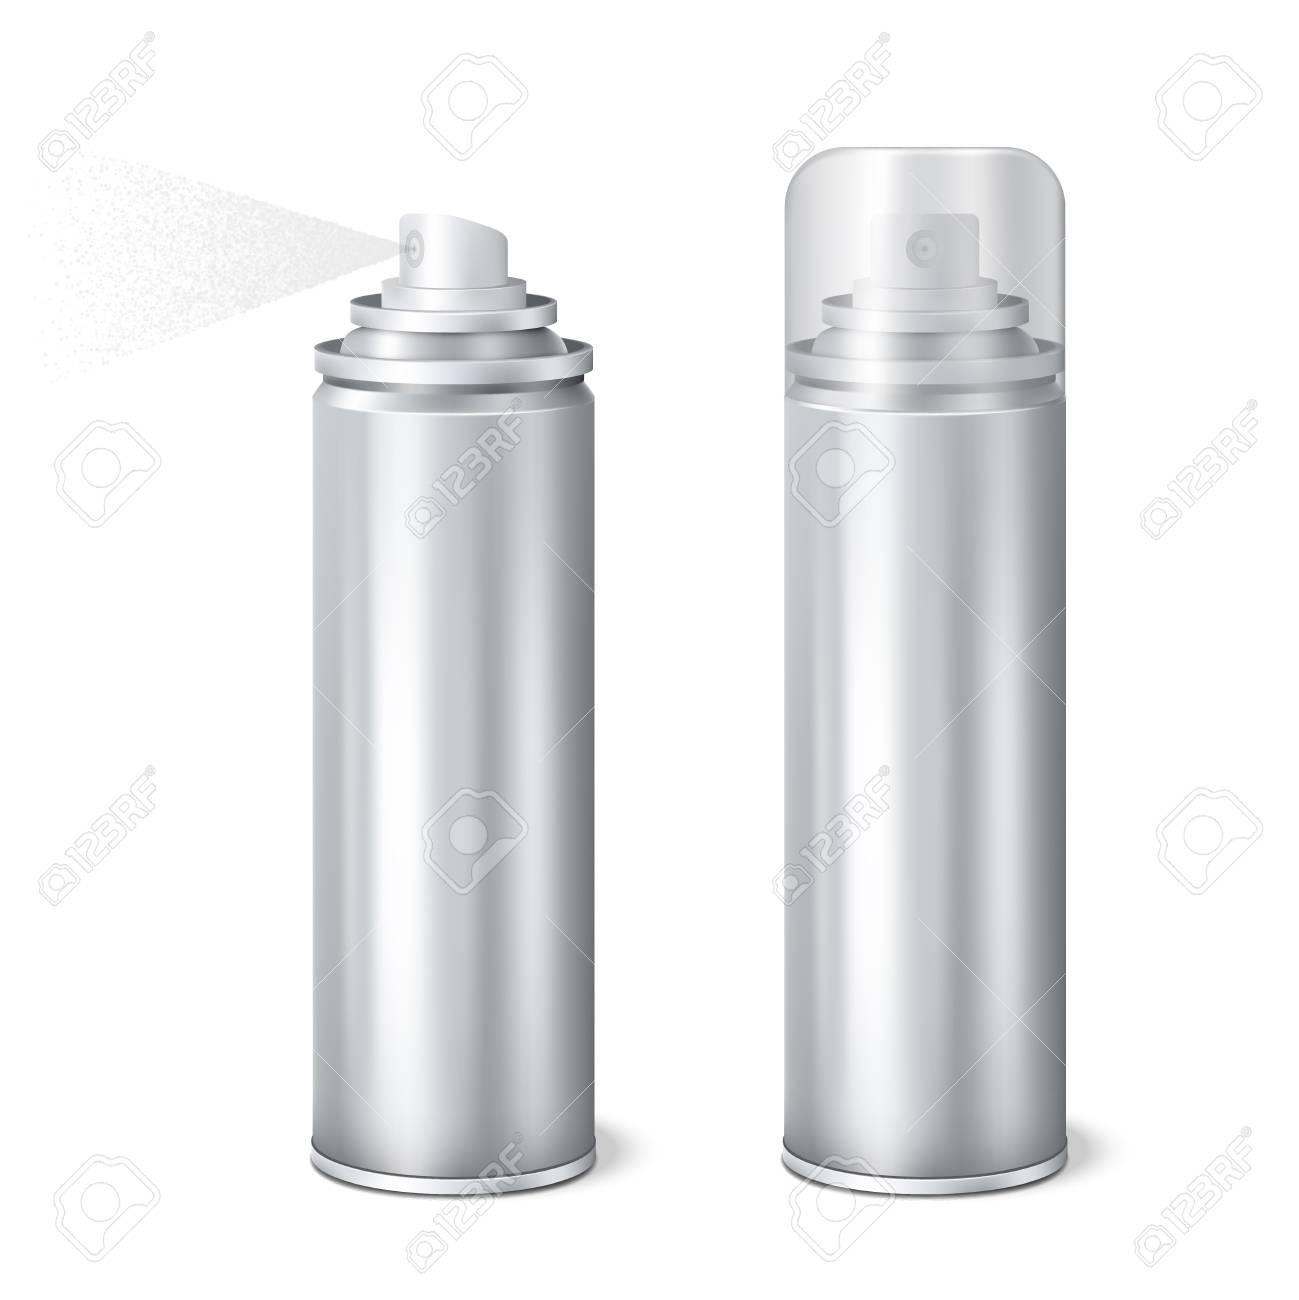 215653cfb3ffb Aluminium aerosol 2 shining realistic mockup cans templates set..